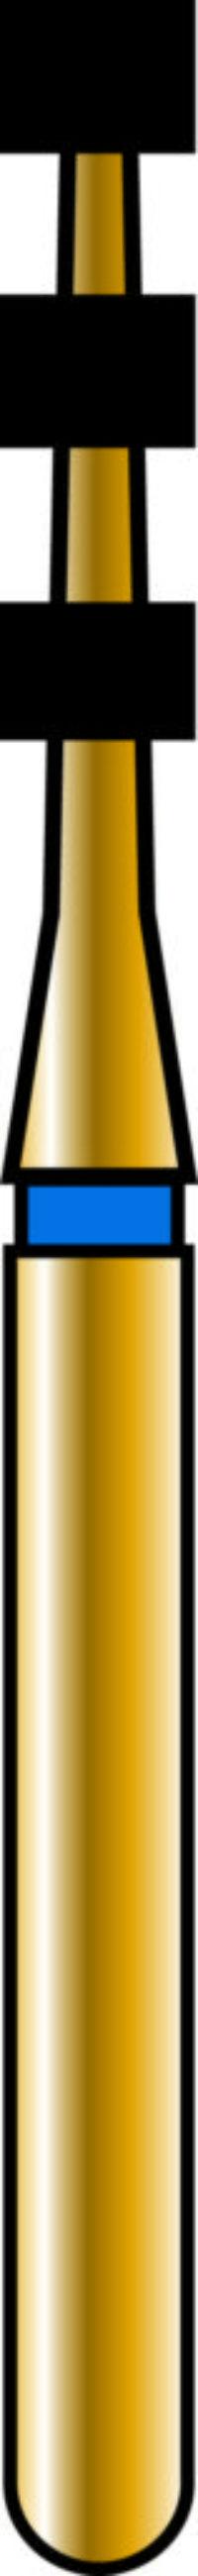 Depth Cutting 21-6.8mm Gold Diamond Bur - Coarse Grit